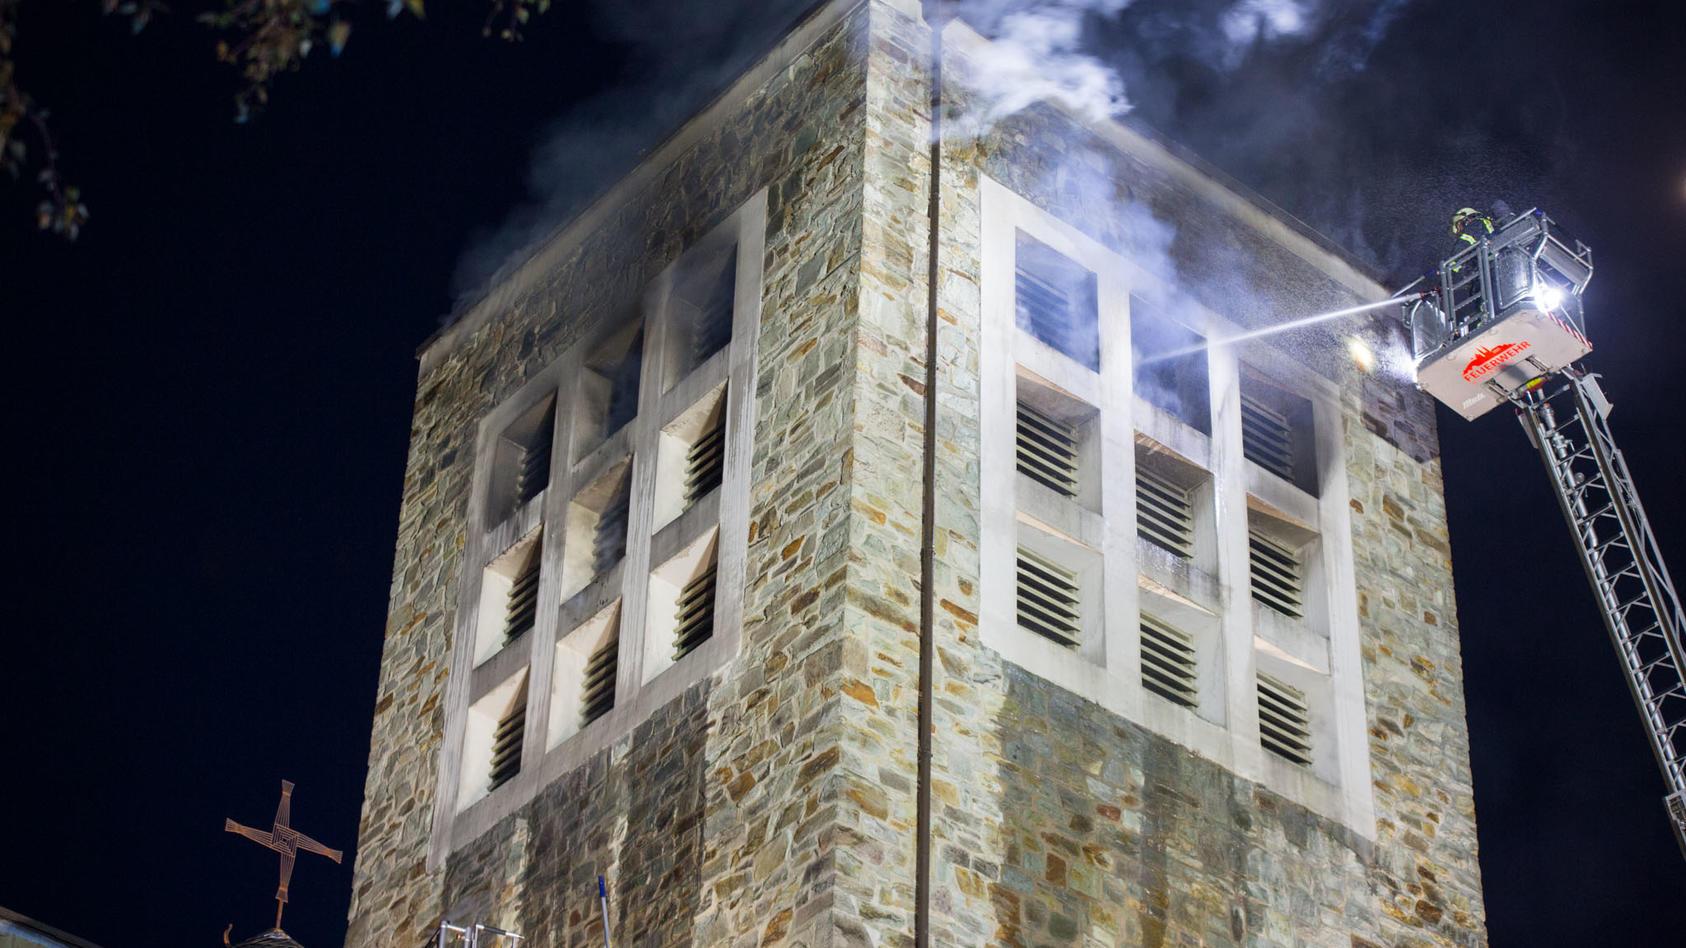 Feuer in Kirchturm in Wiesbaden ausgebrochen